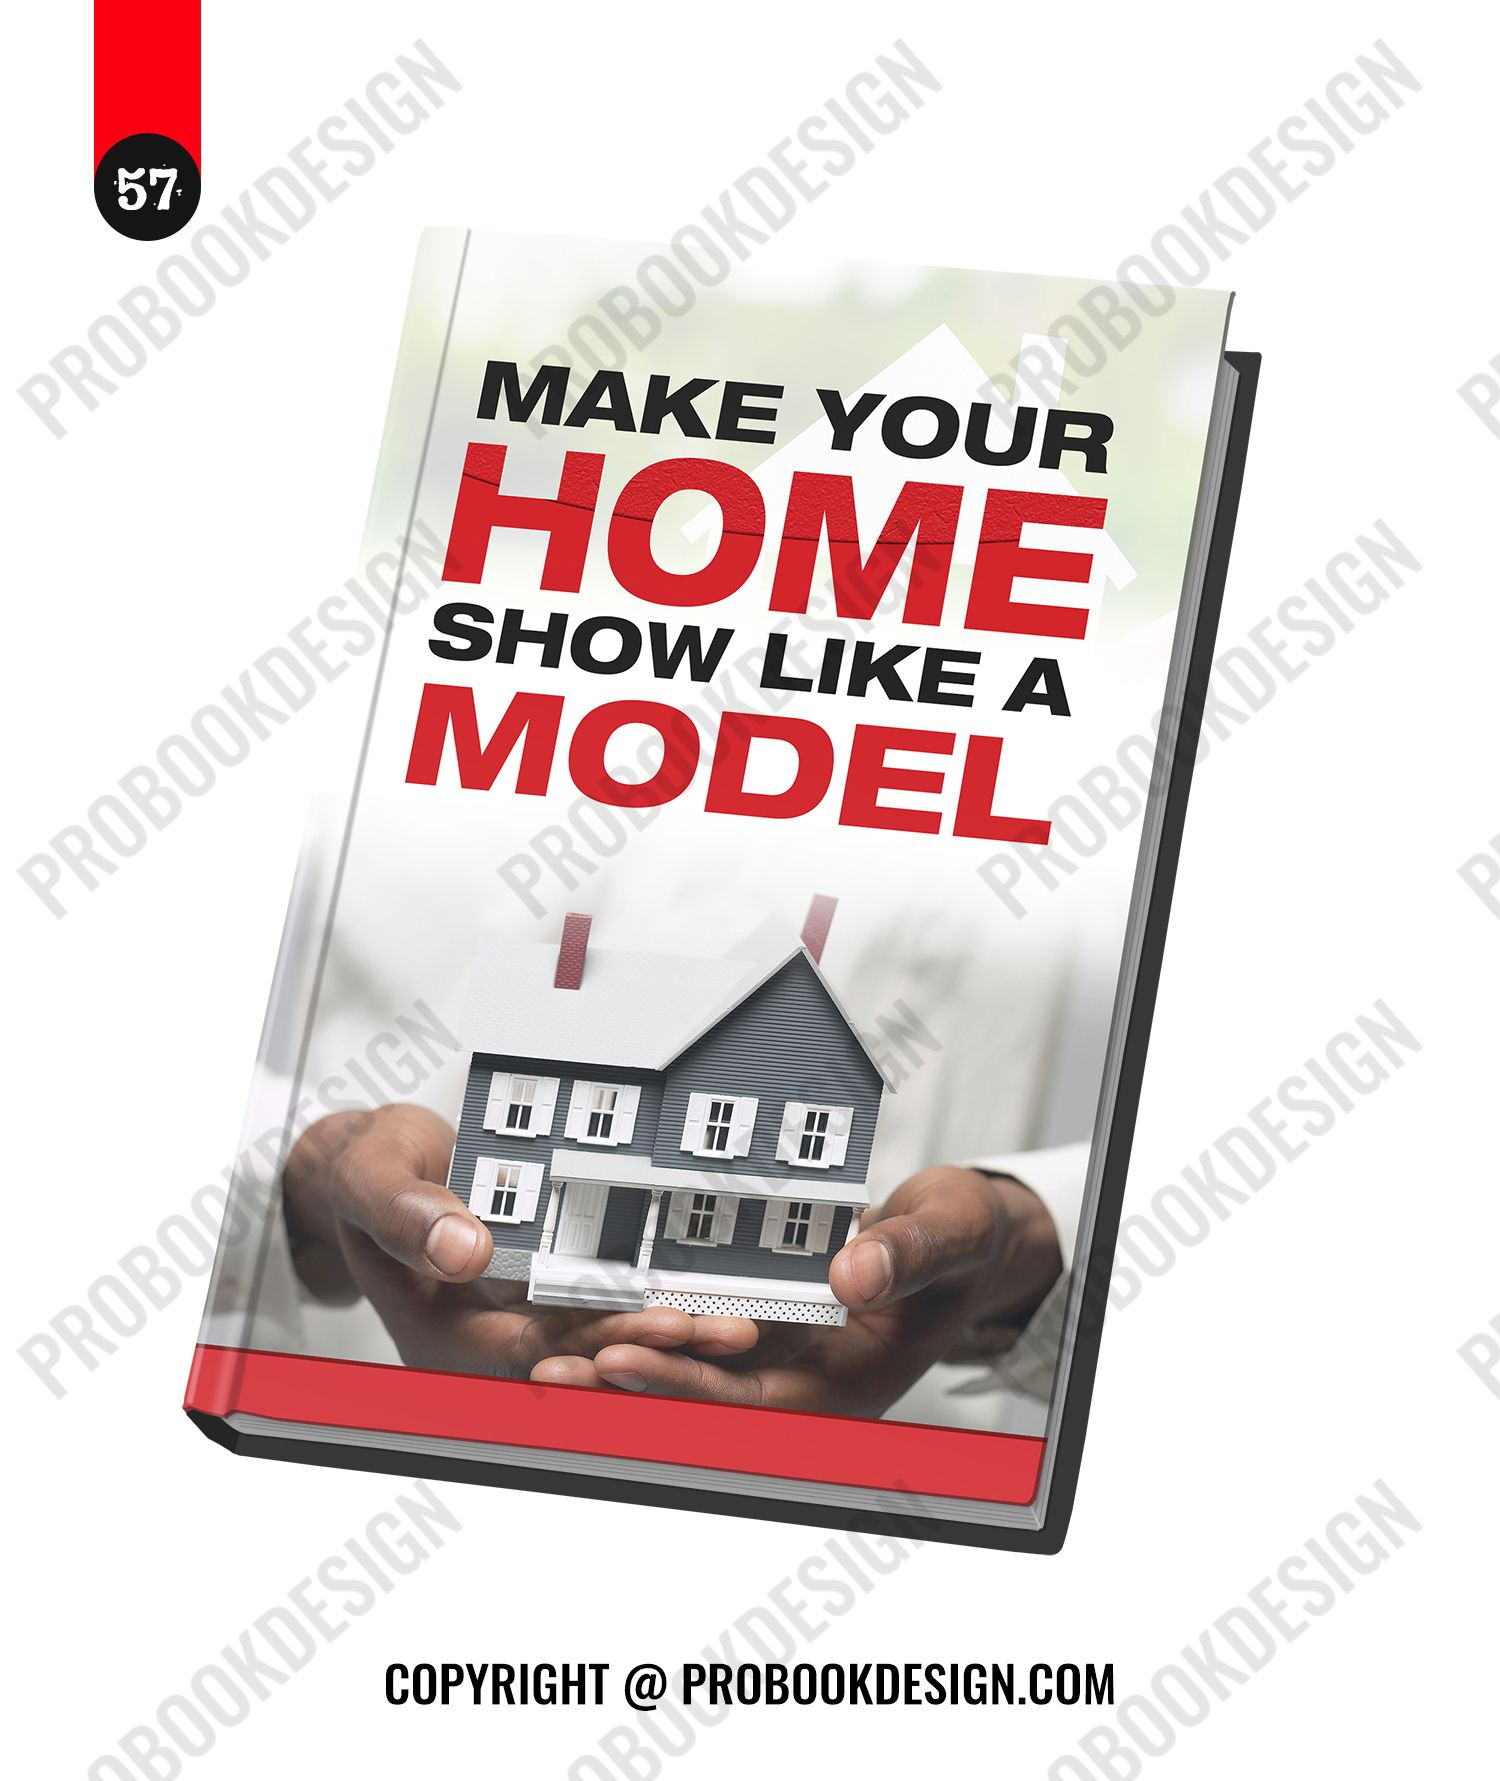 Probookdesigns I Will Design Amazing Book Cover For 5 On Fiverr Com Book Cover Mockup Book Cover Design Ebook Cover